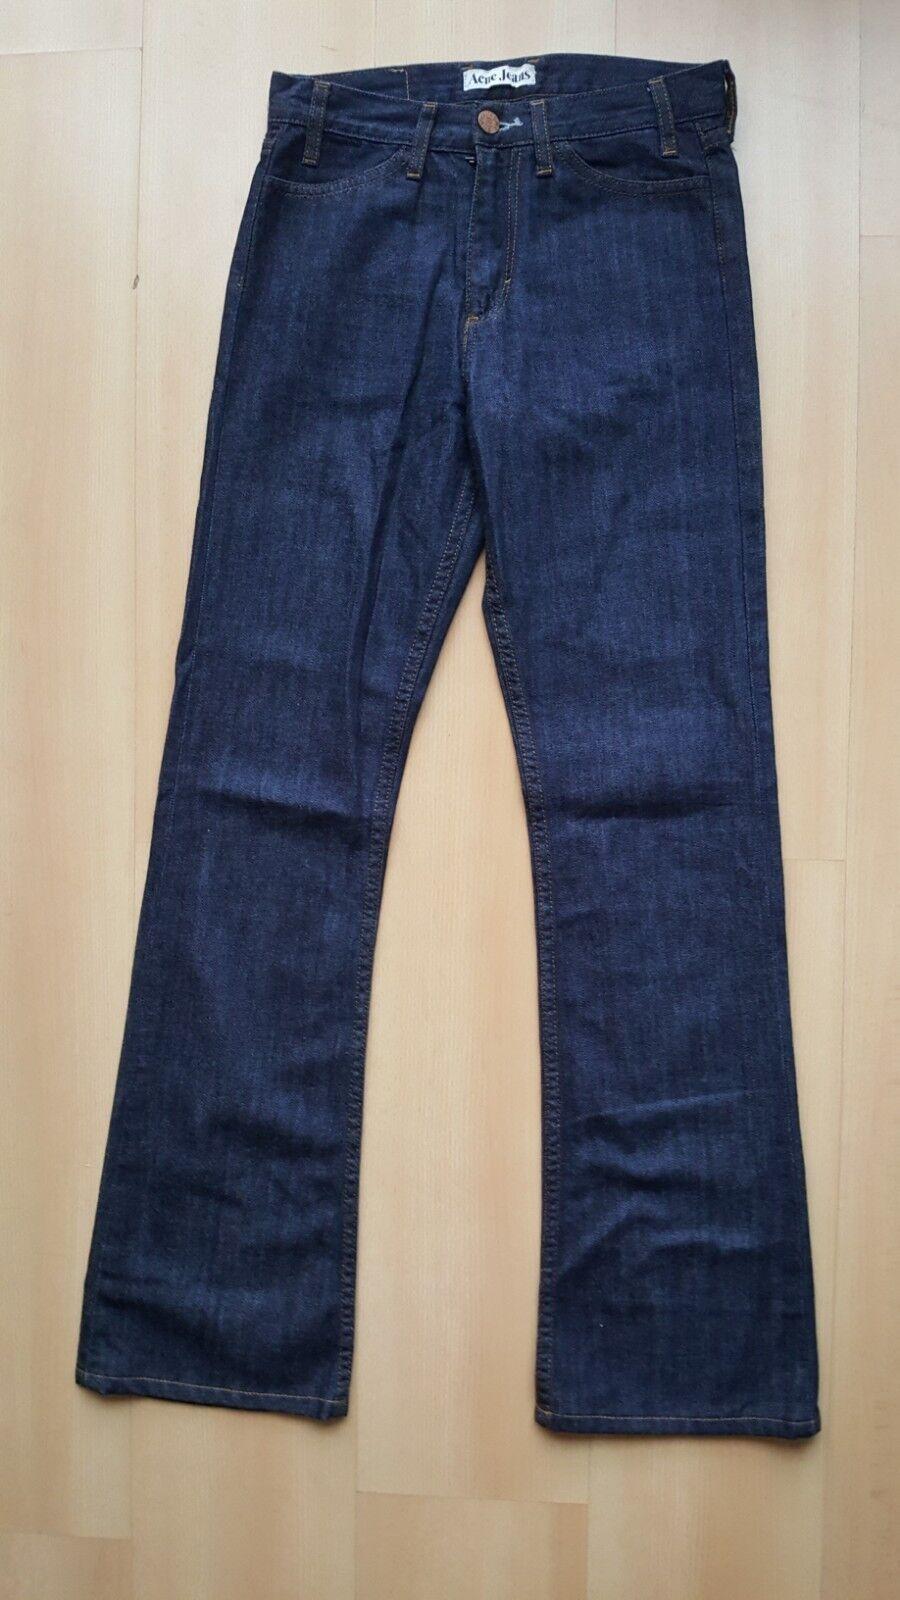 ACNE Jeans Luv bluee Denim Women's Jeans Size W25 L34